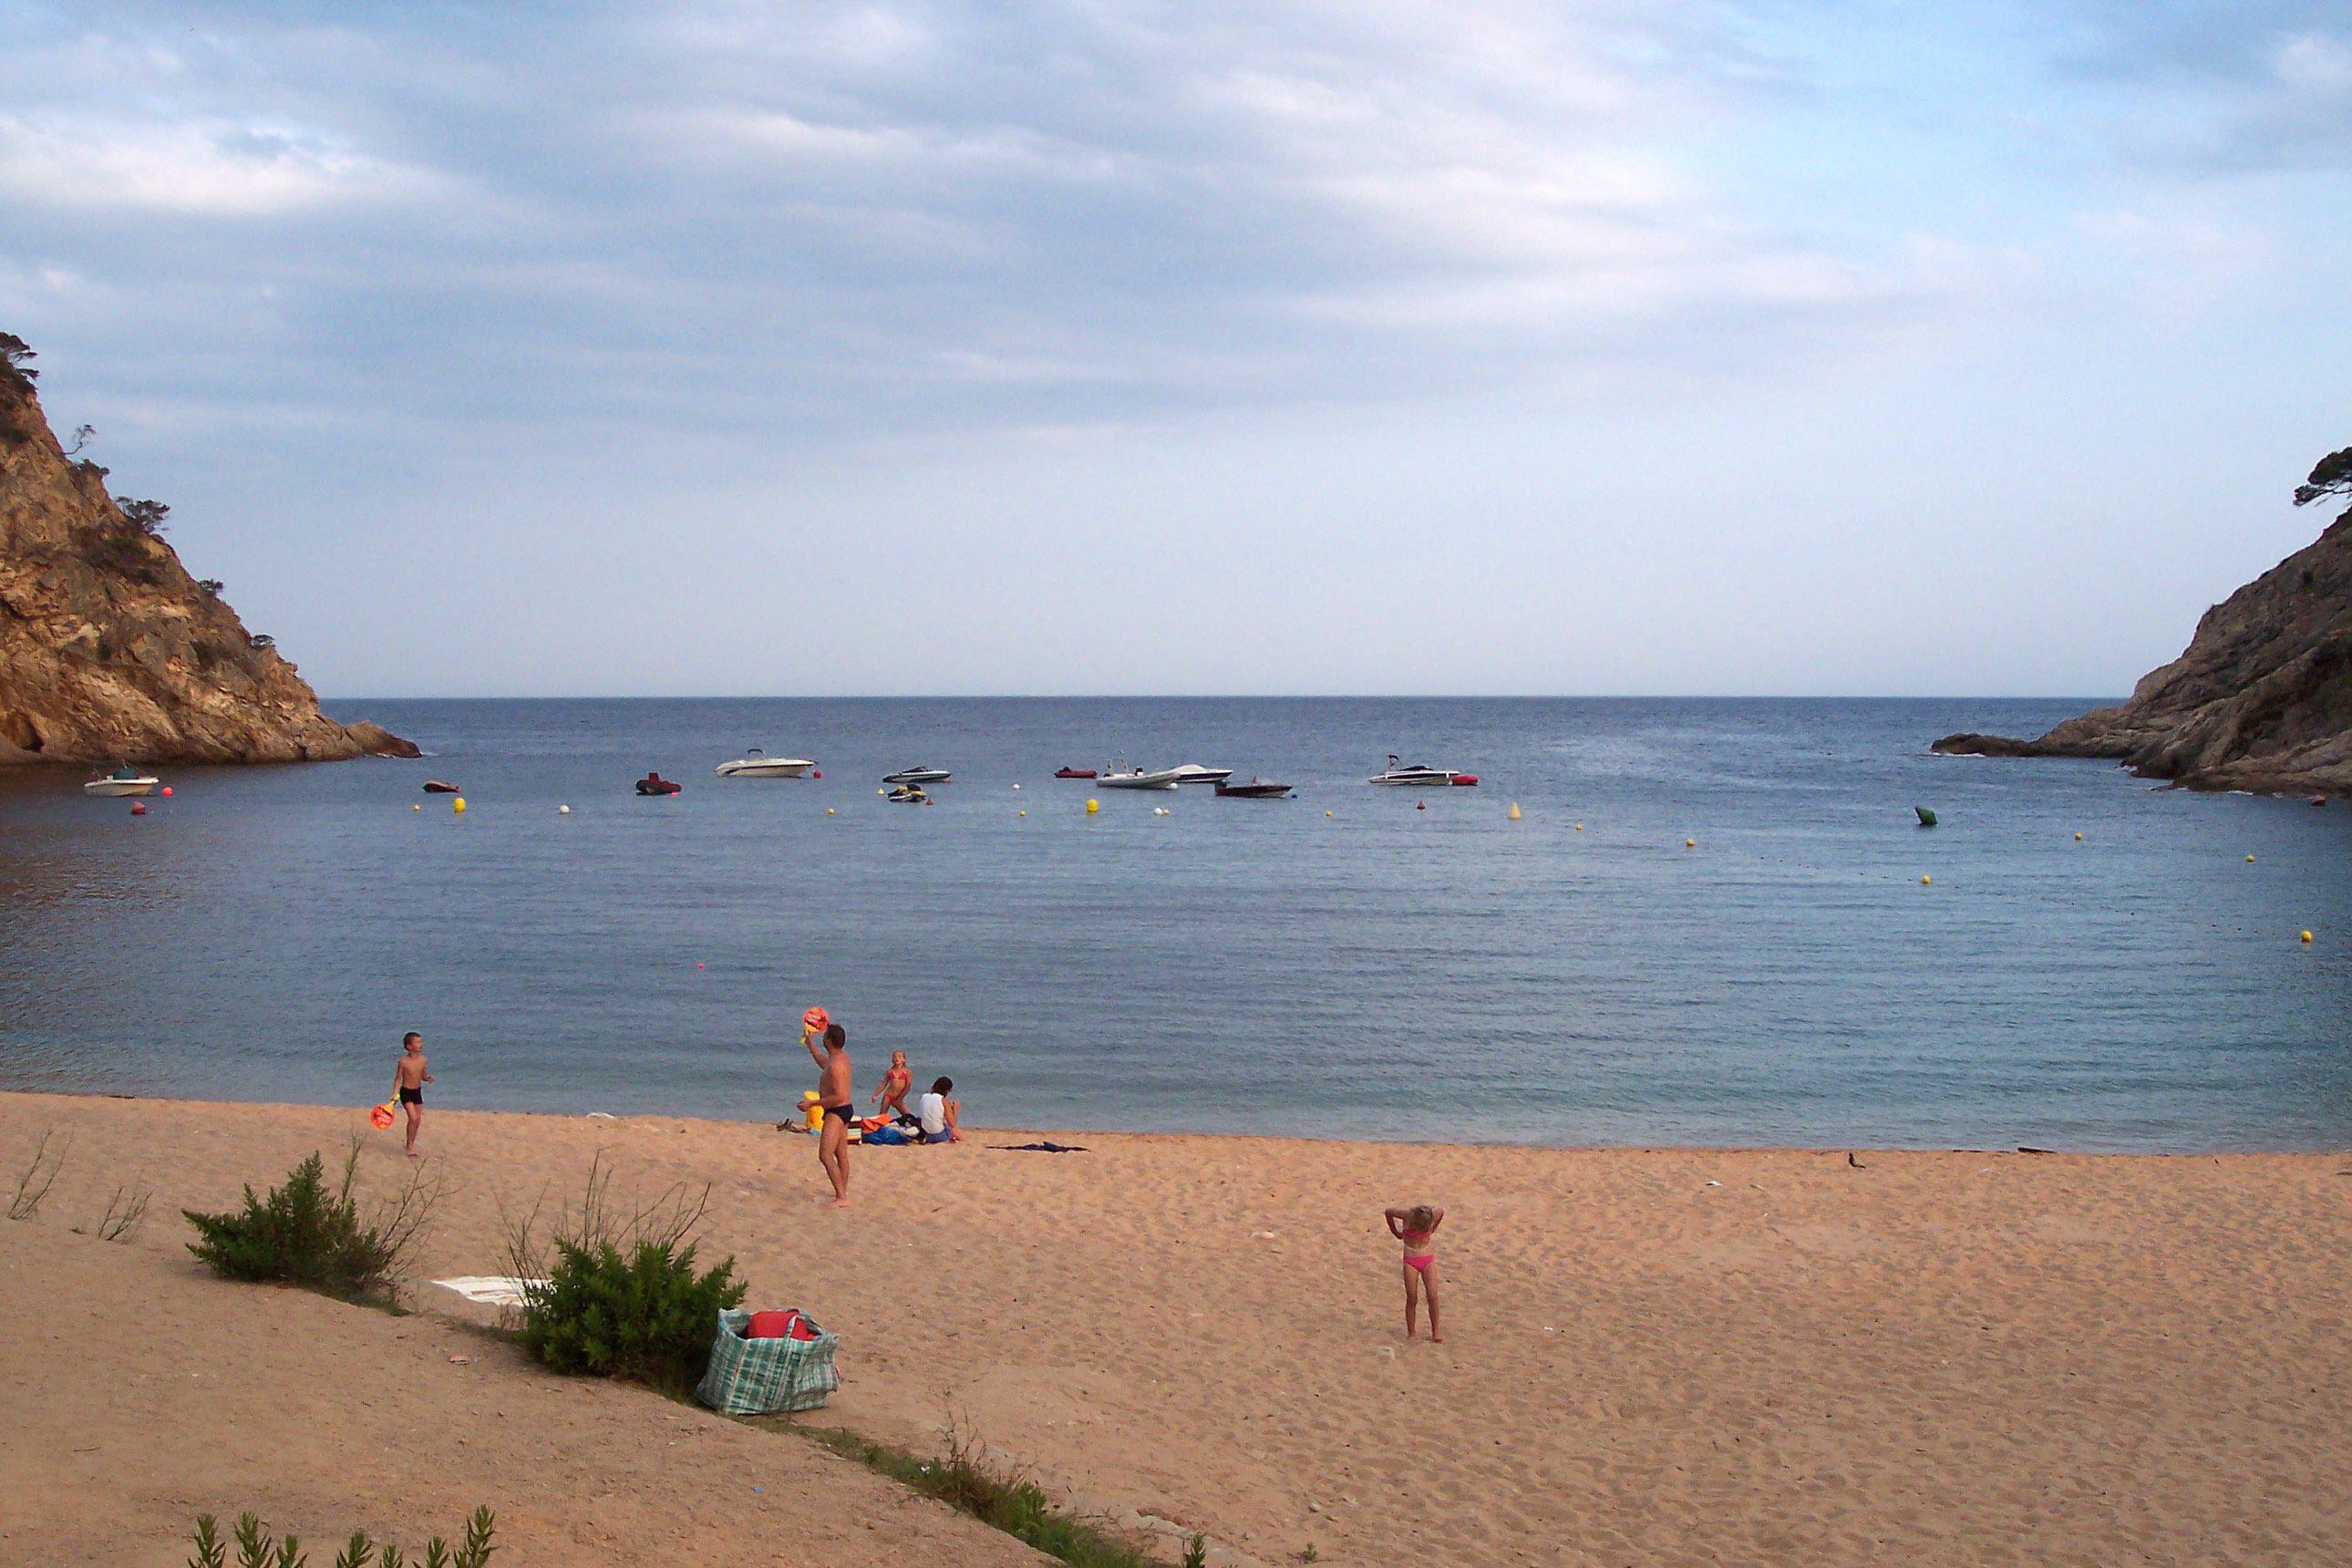 Foto playa Cala Bona. Giverola beach, by Julio M. Merino